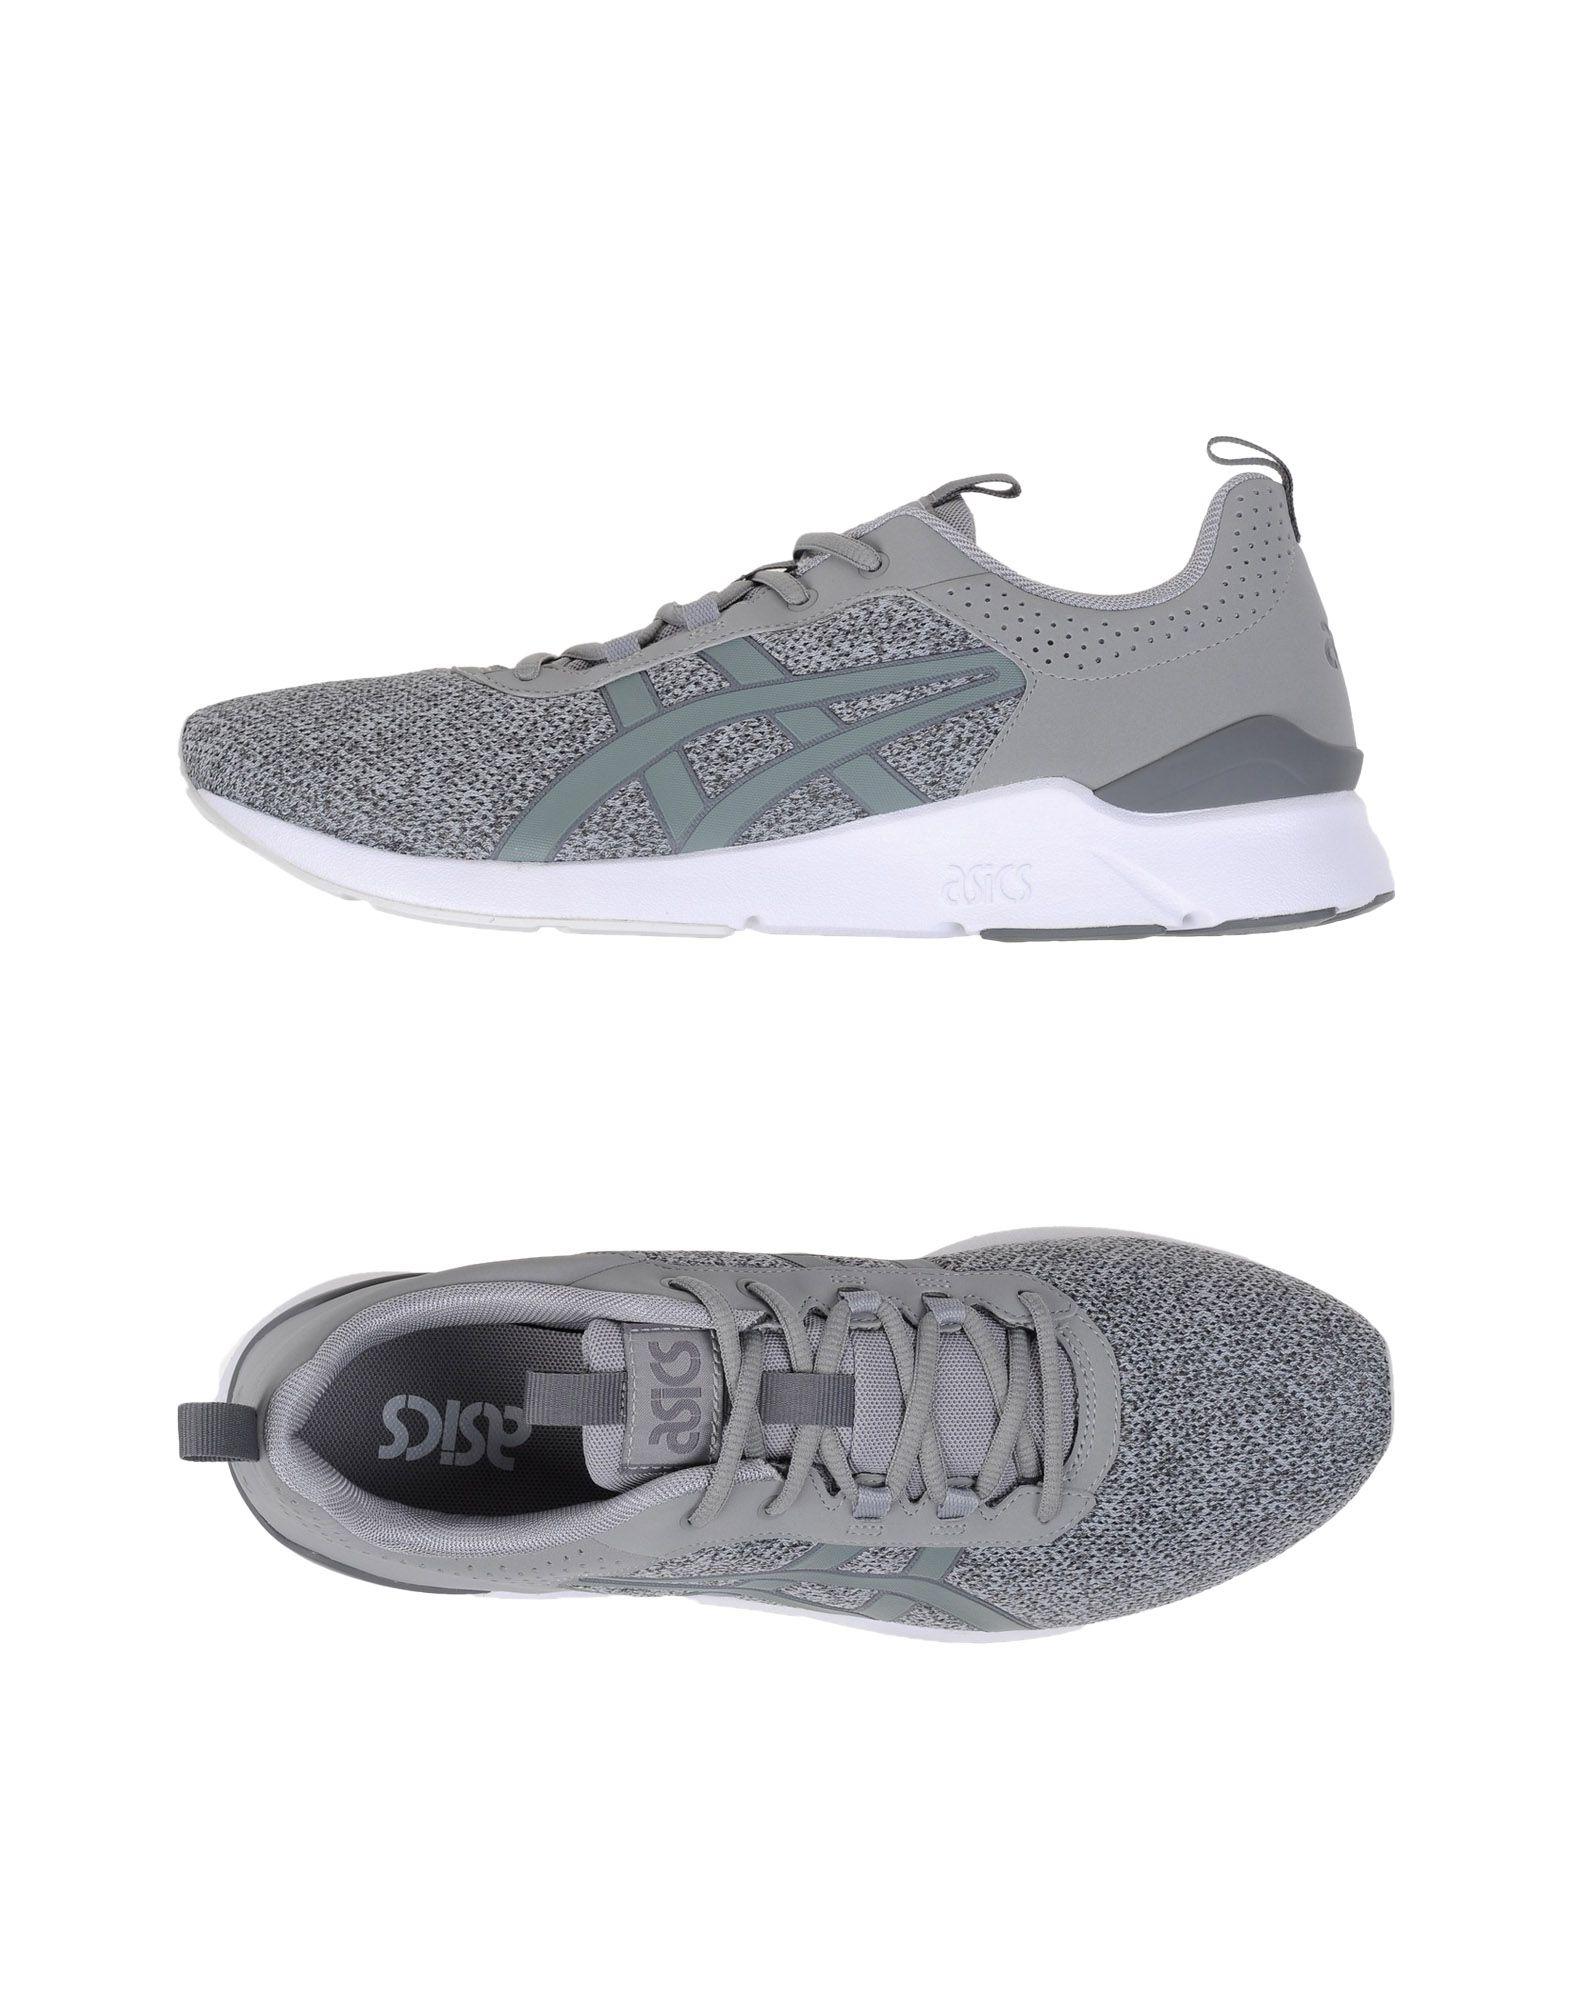 ASICS TIGER Herren Low Sneakers & Tennisschuhe Farbe Grau Größe 14